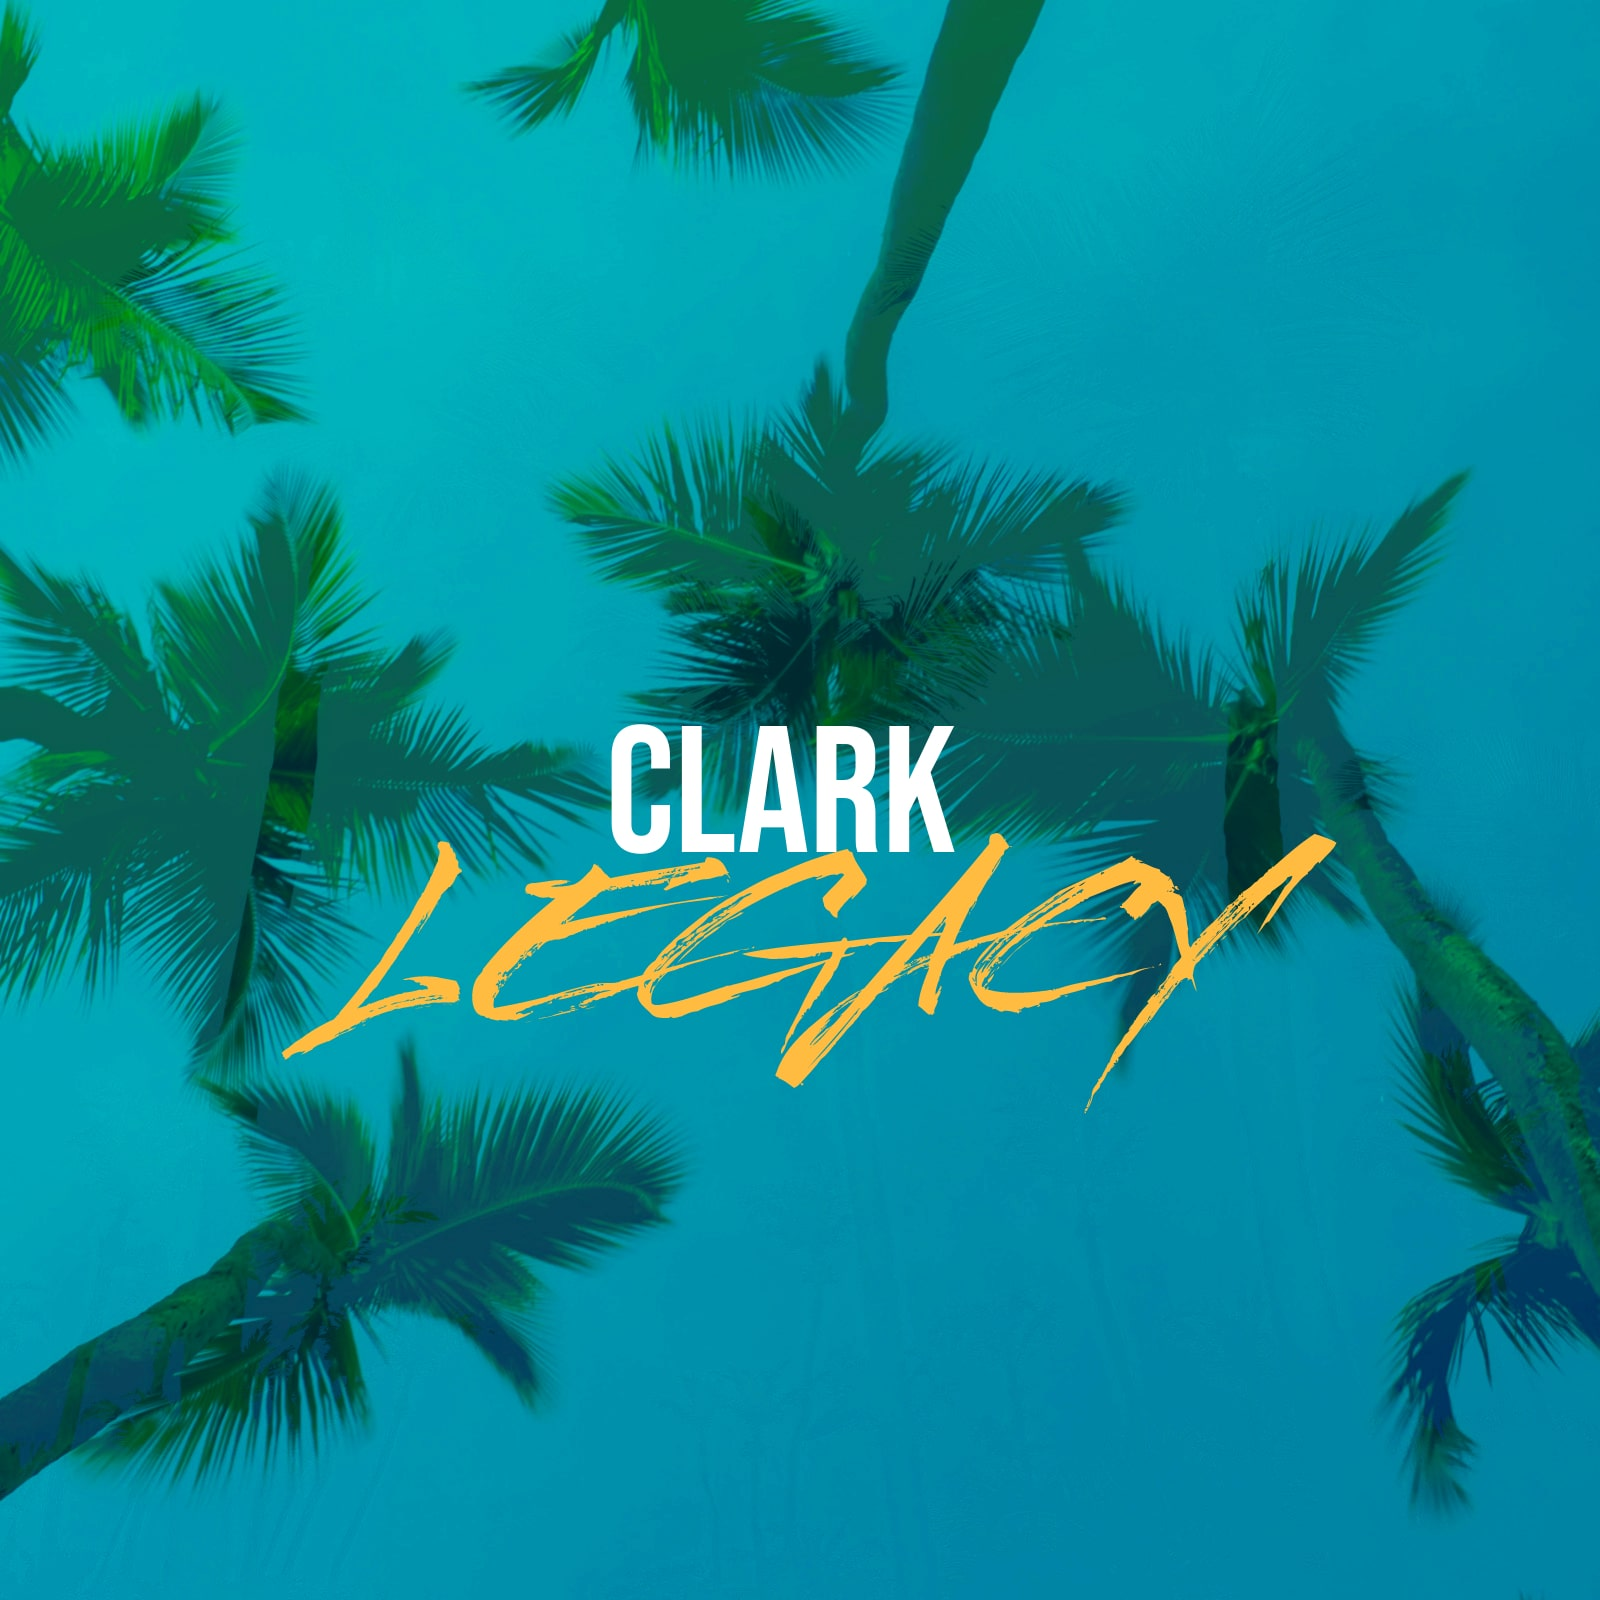 Upcoming: Clark - Legacy